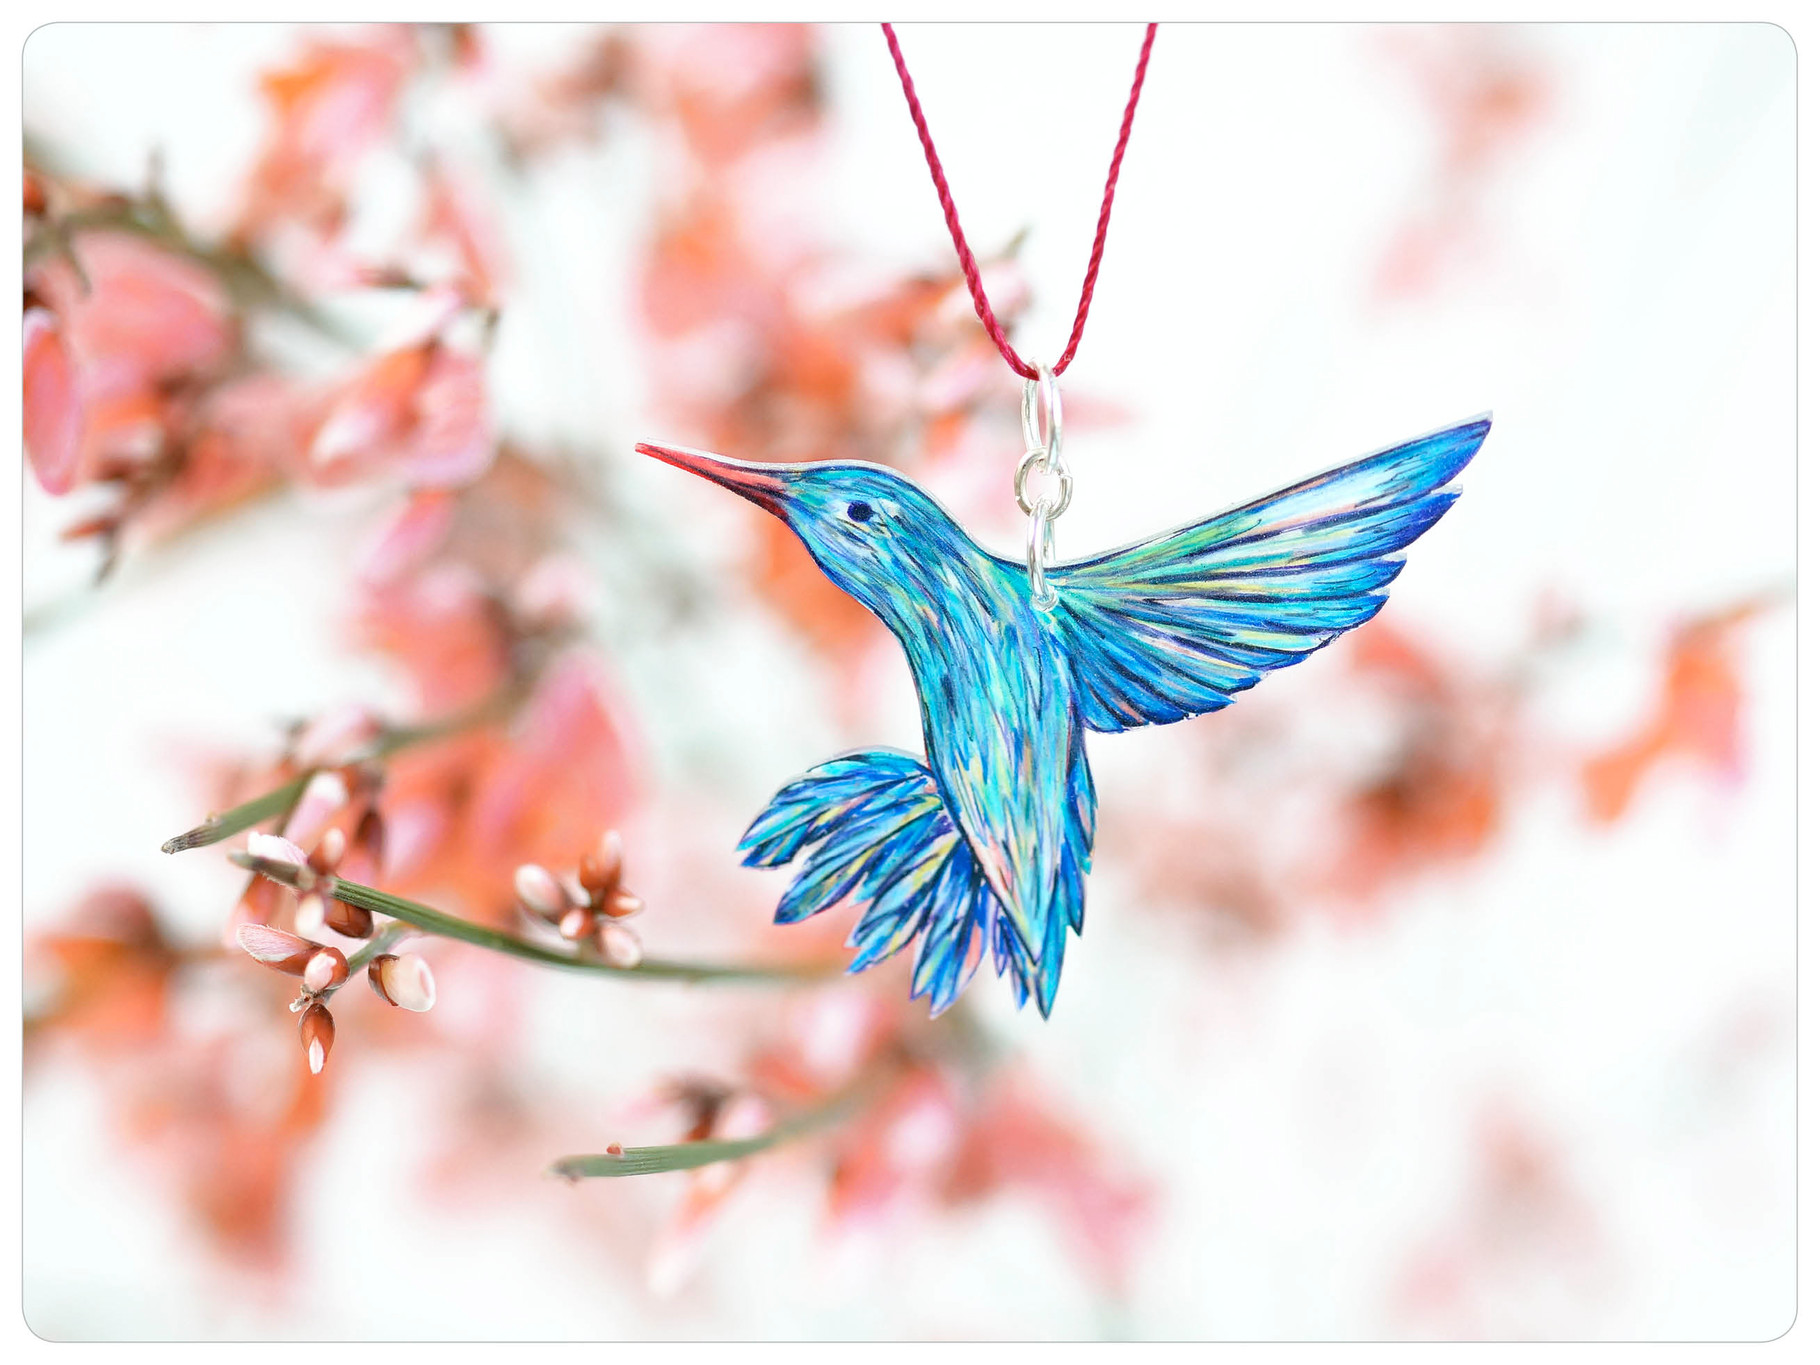 kolibri kette schmuckfaden hummingbird chain. Black Bedroom Furniture Sets. Home Design Ideas